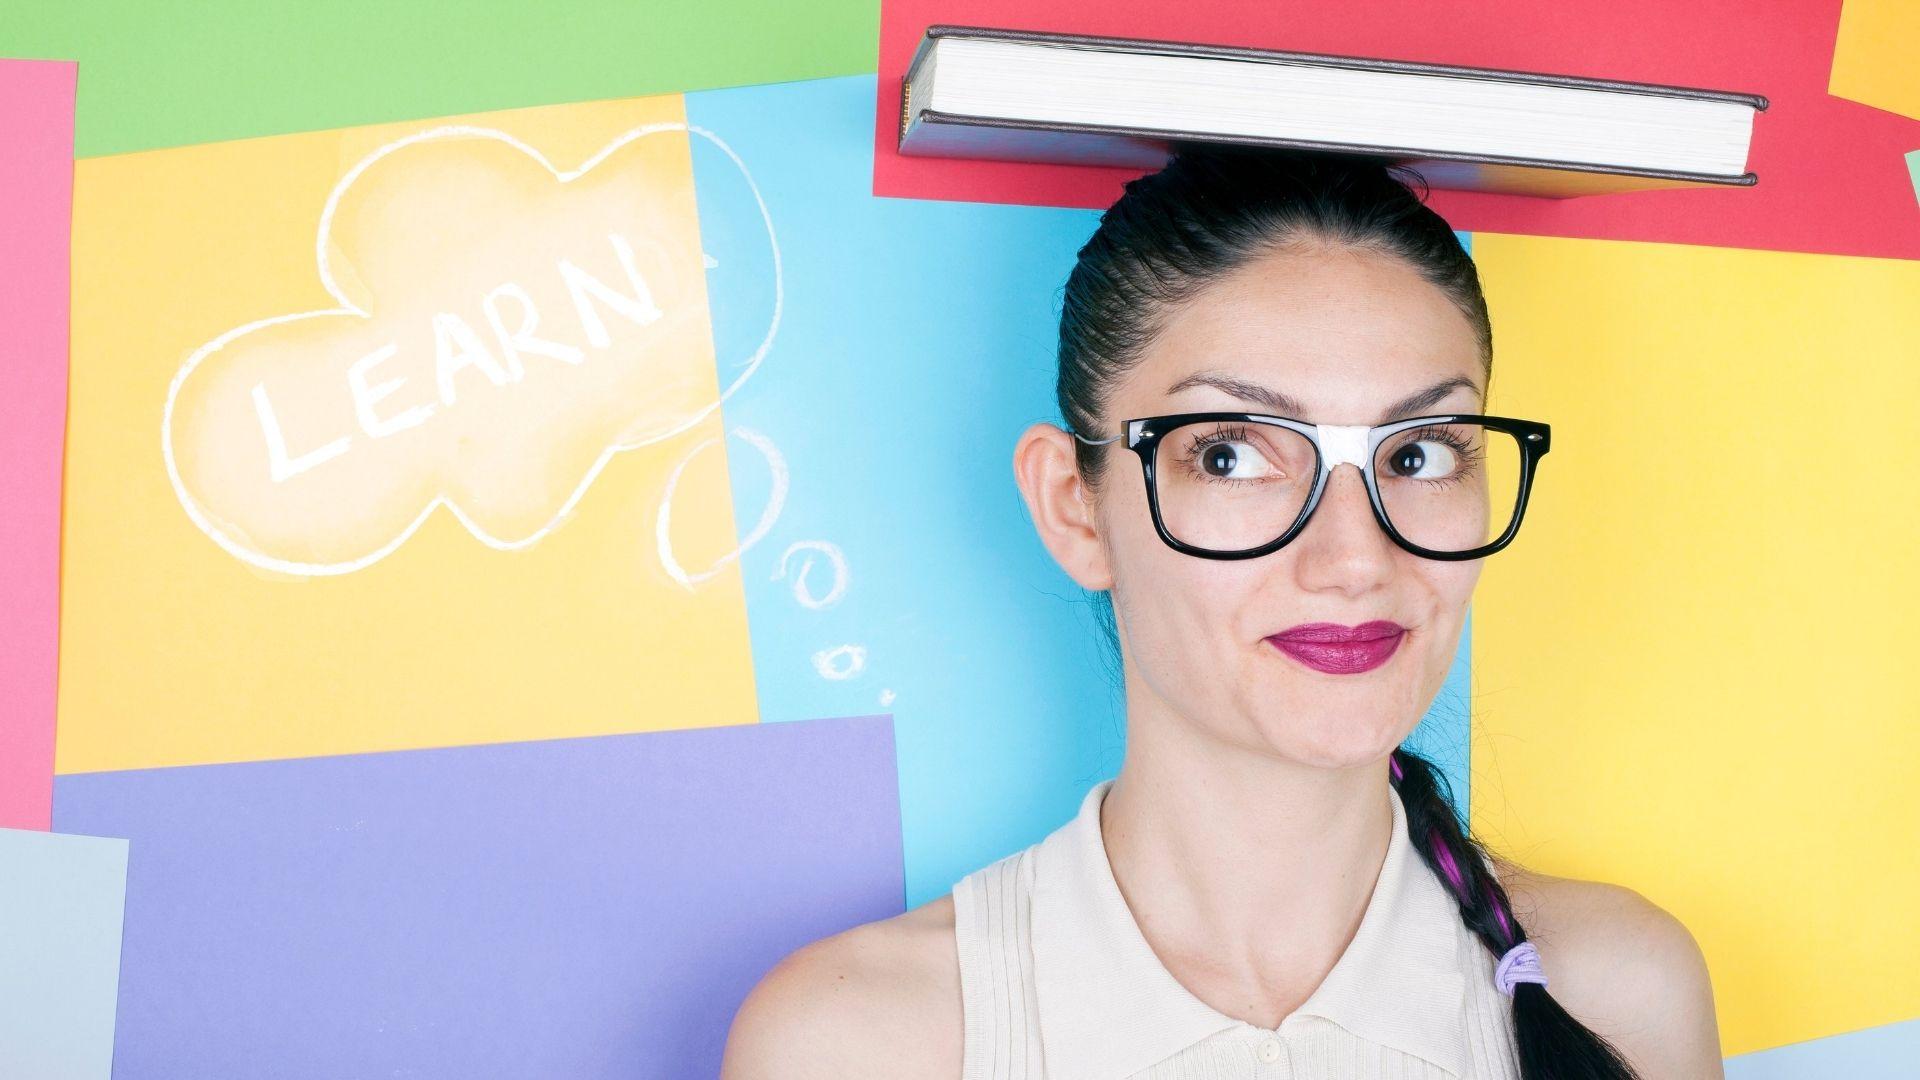 5 Factors Behind Successful Educational Video Games